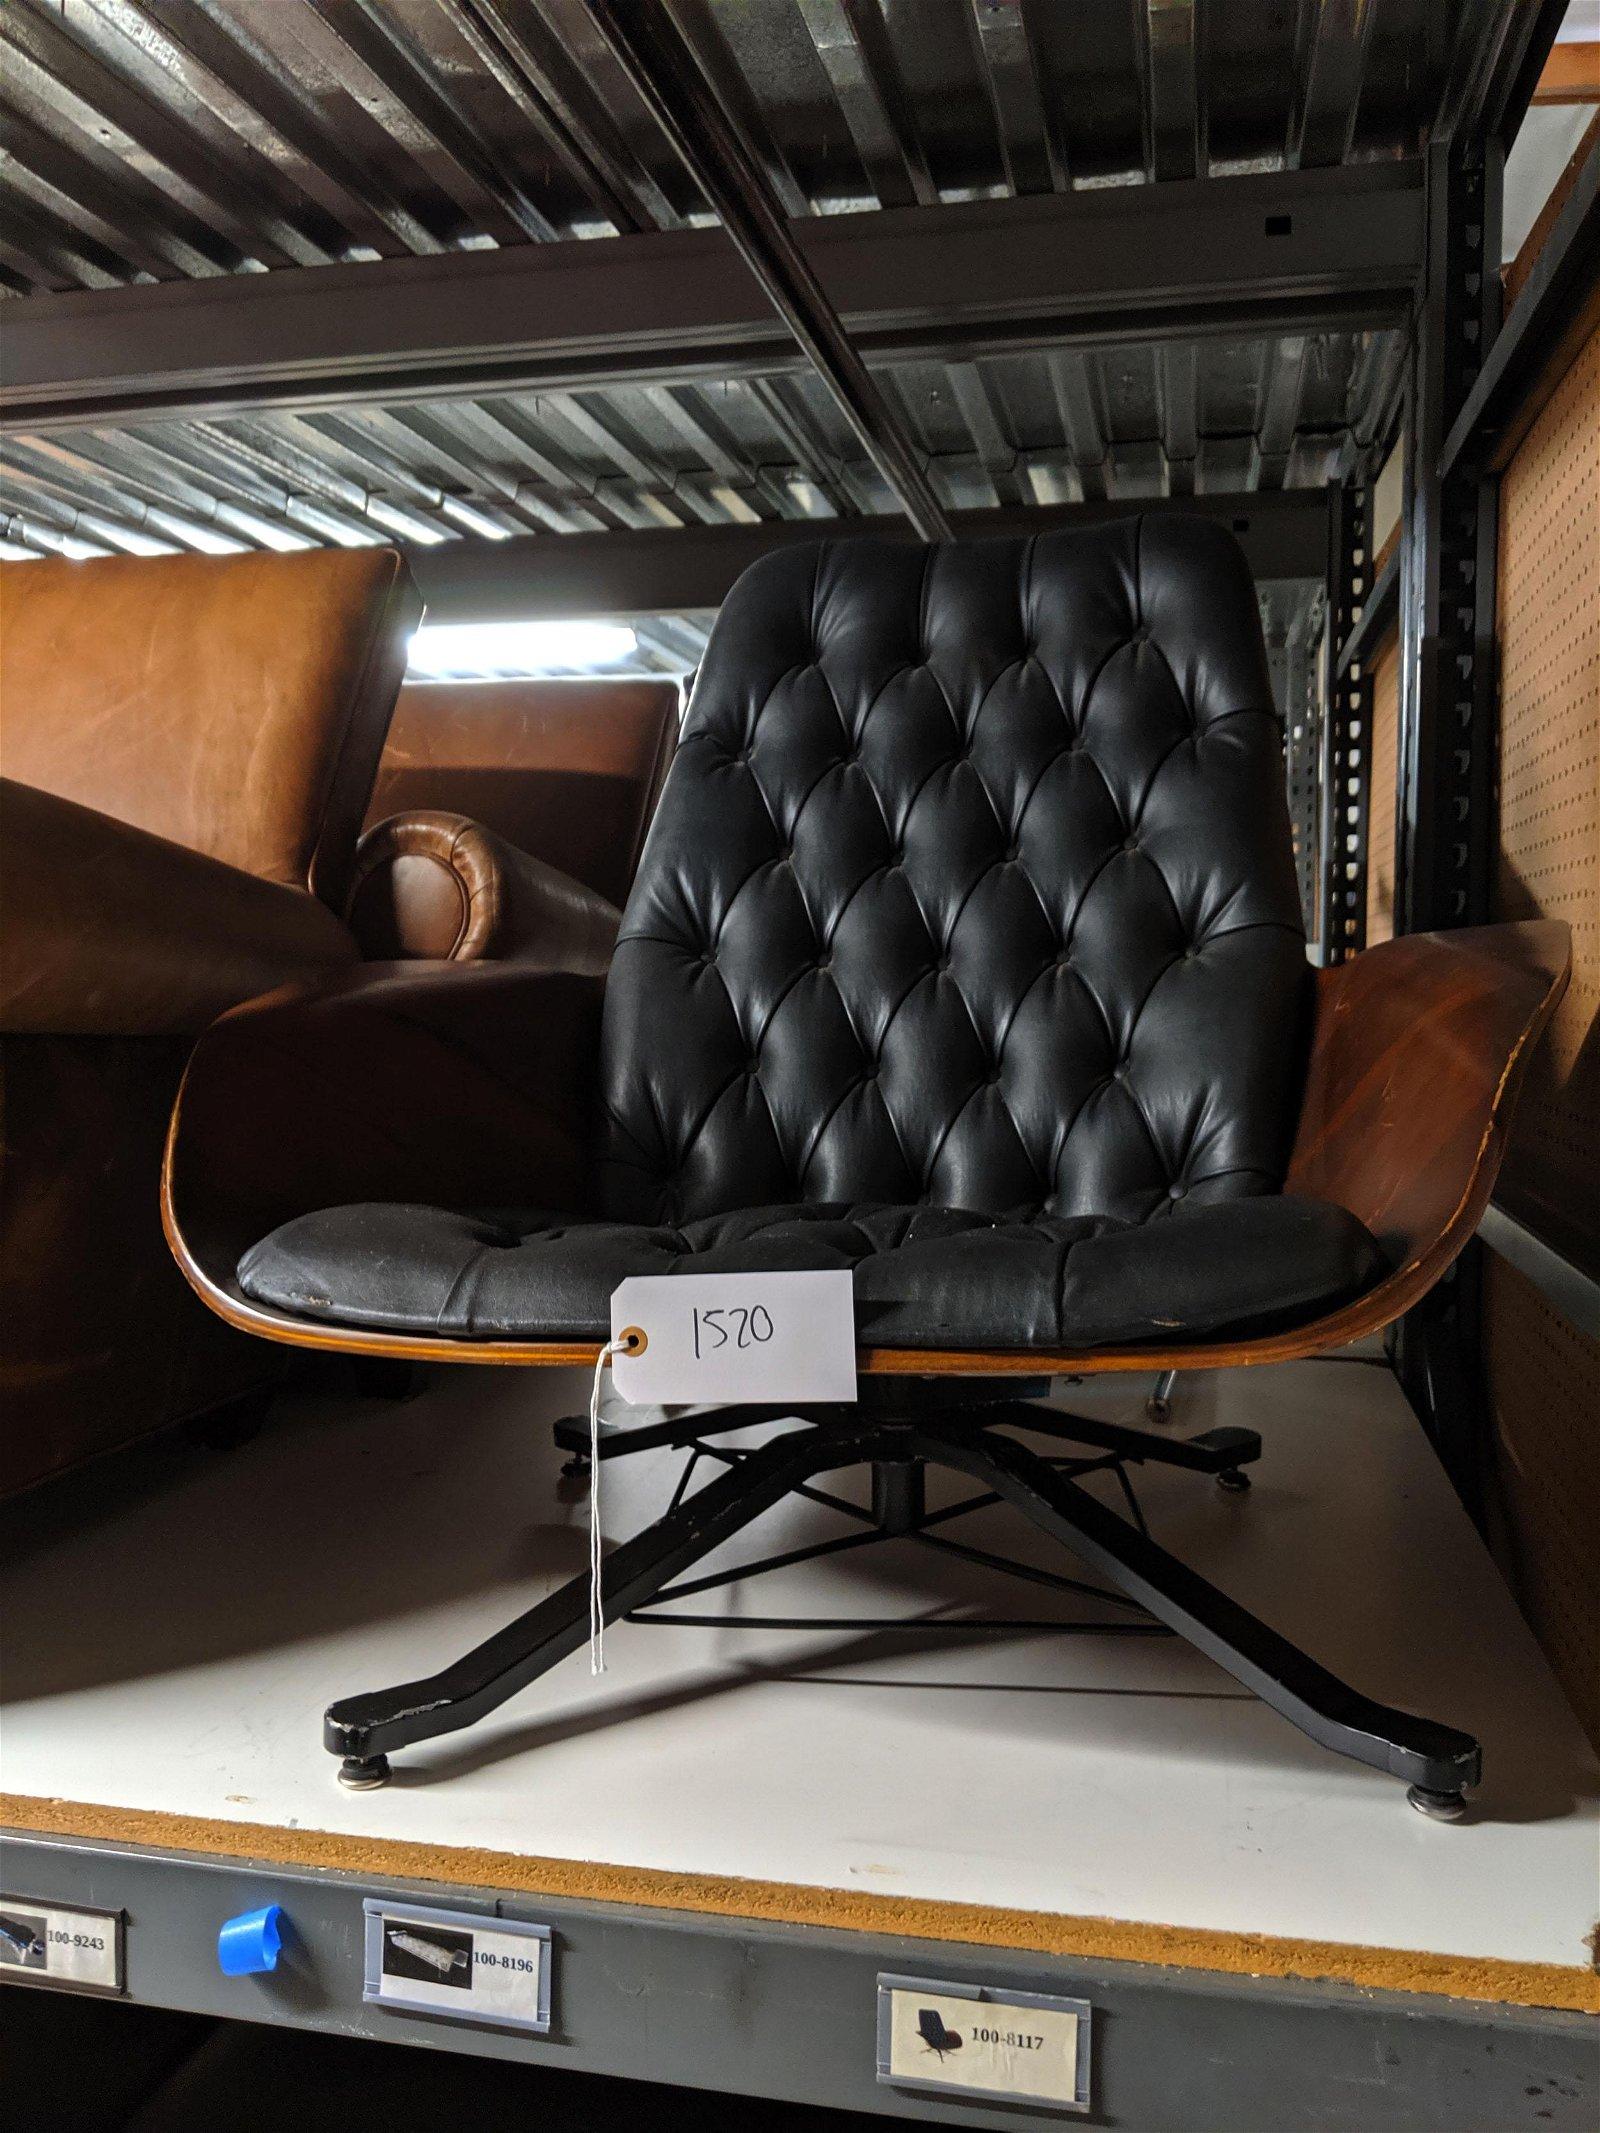 Mr. Chair Swiveling Lounge Chair